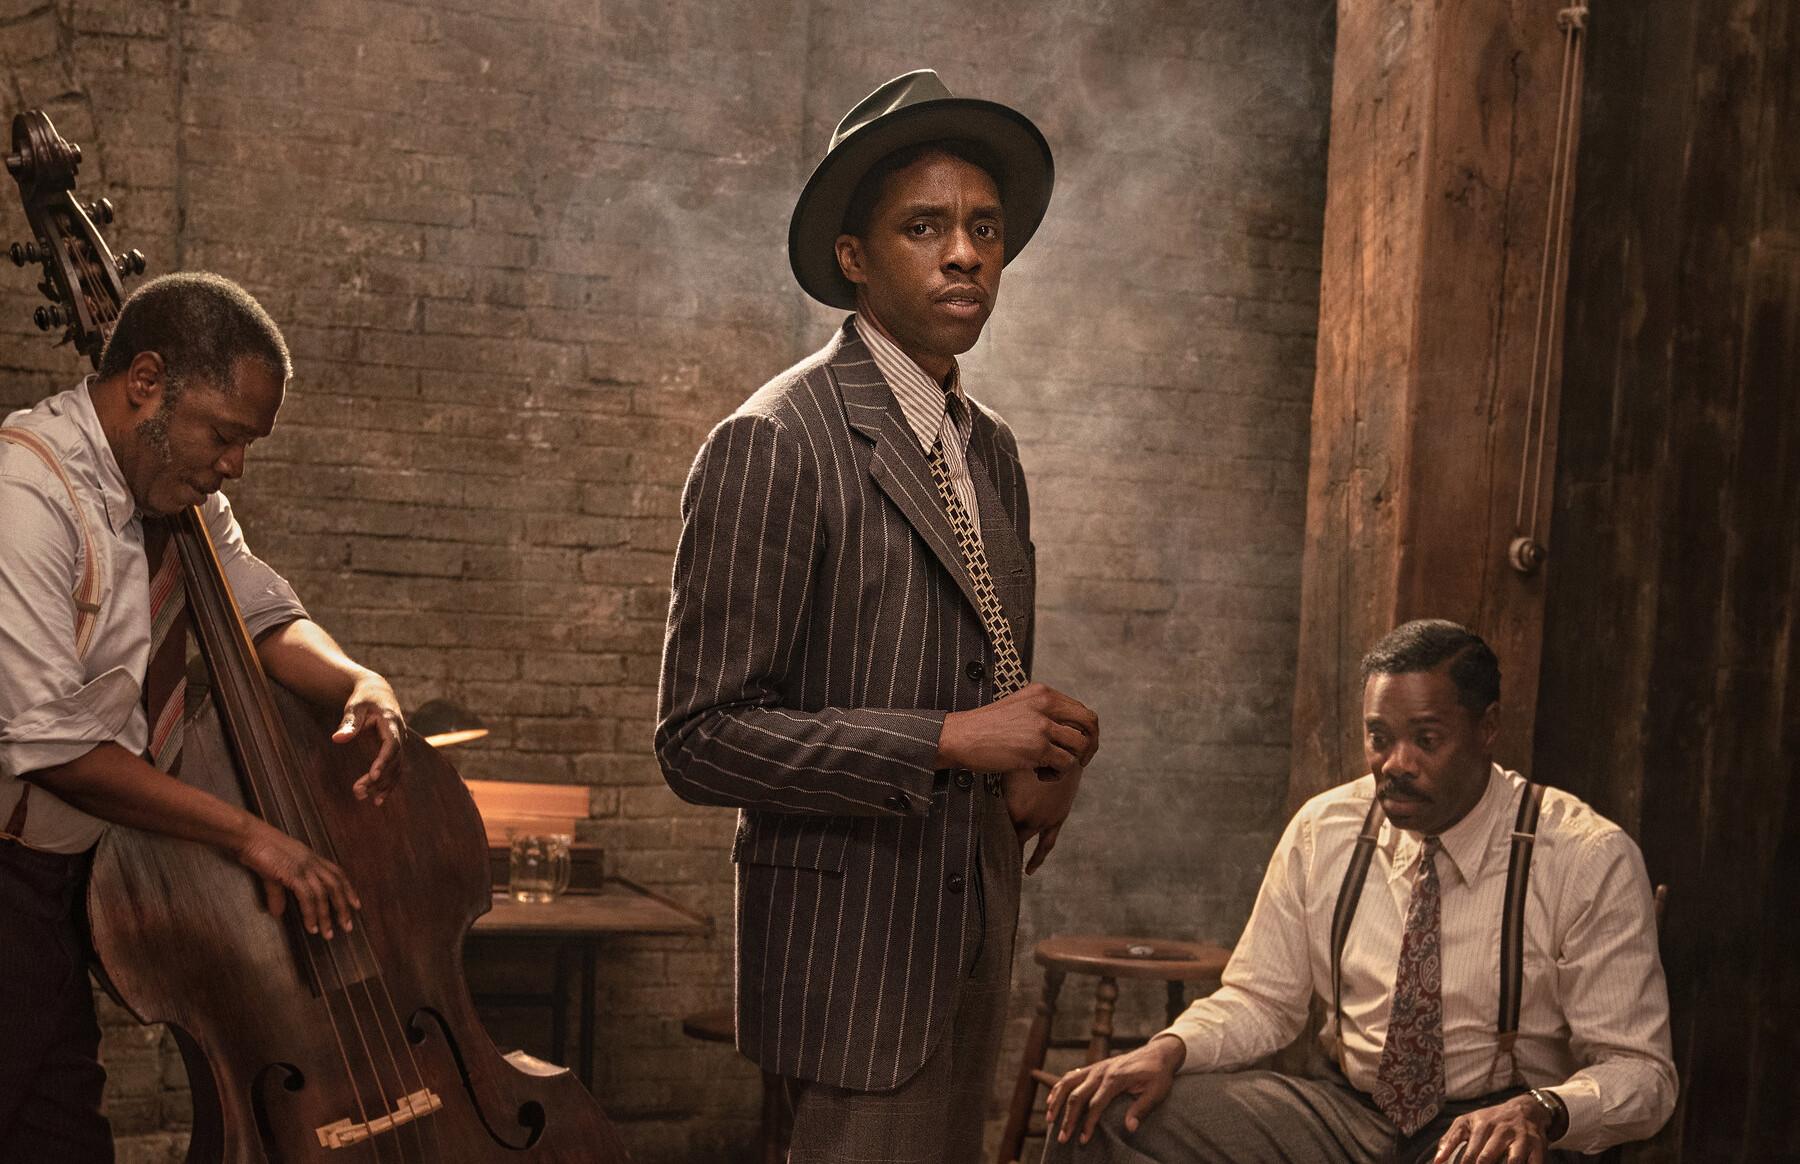 Ma Rainey's Black Bottom: Μια από τις καλύτερες μετά θάνατον ερμηνείες σε μια ταινιάρα